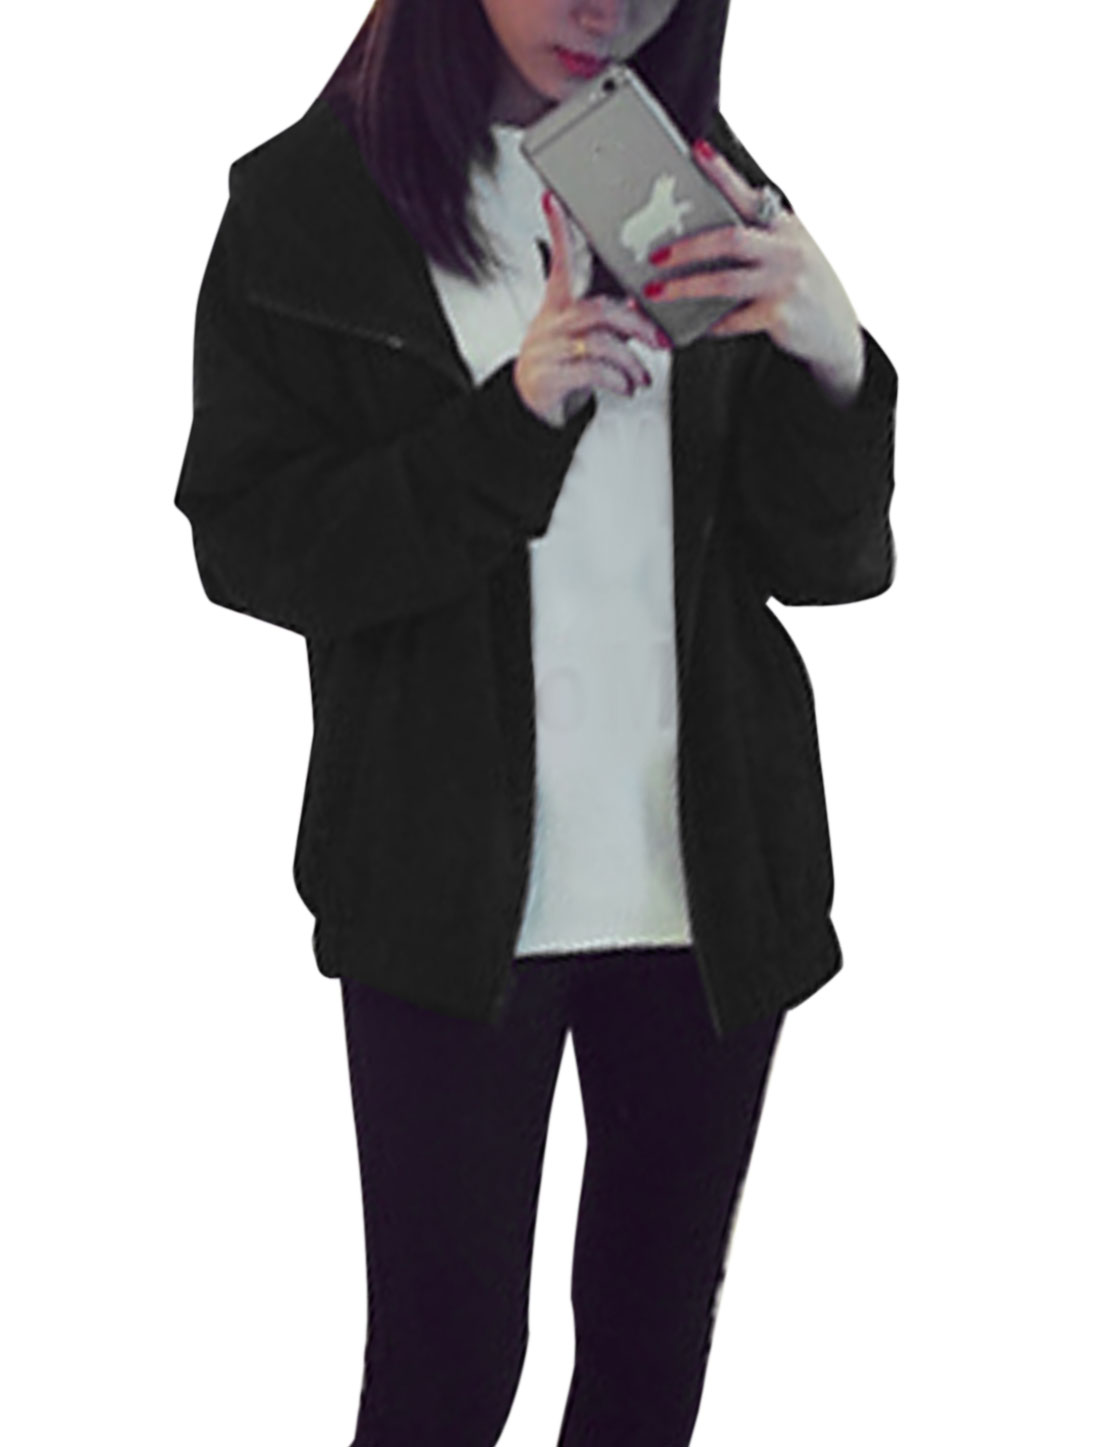 Women Side Pockets Batwing Sleeves Zip Up Hooded Jacket Black XS